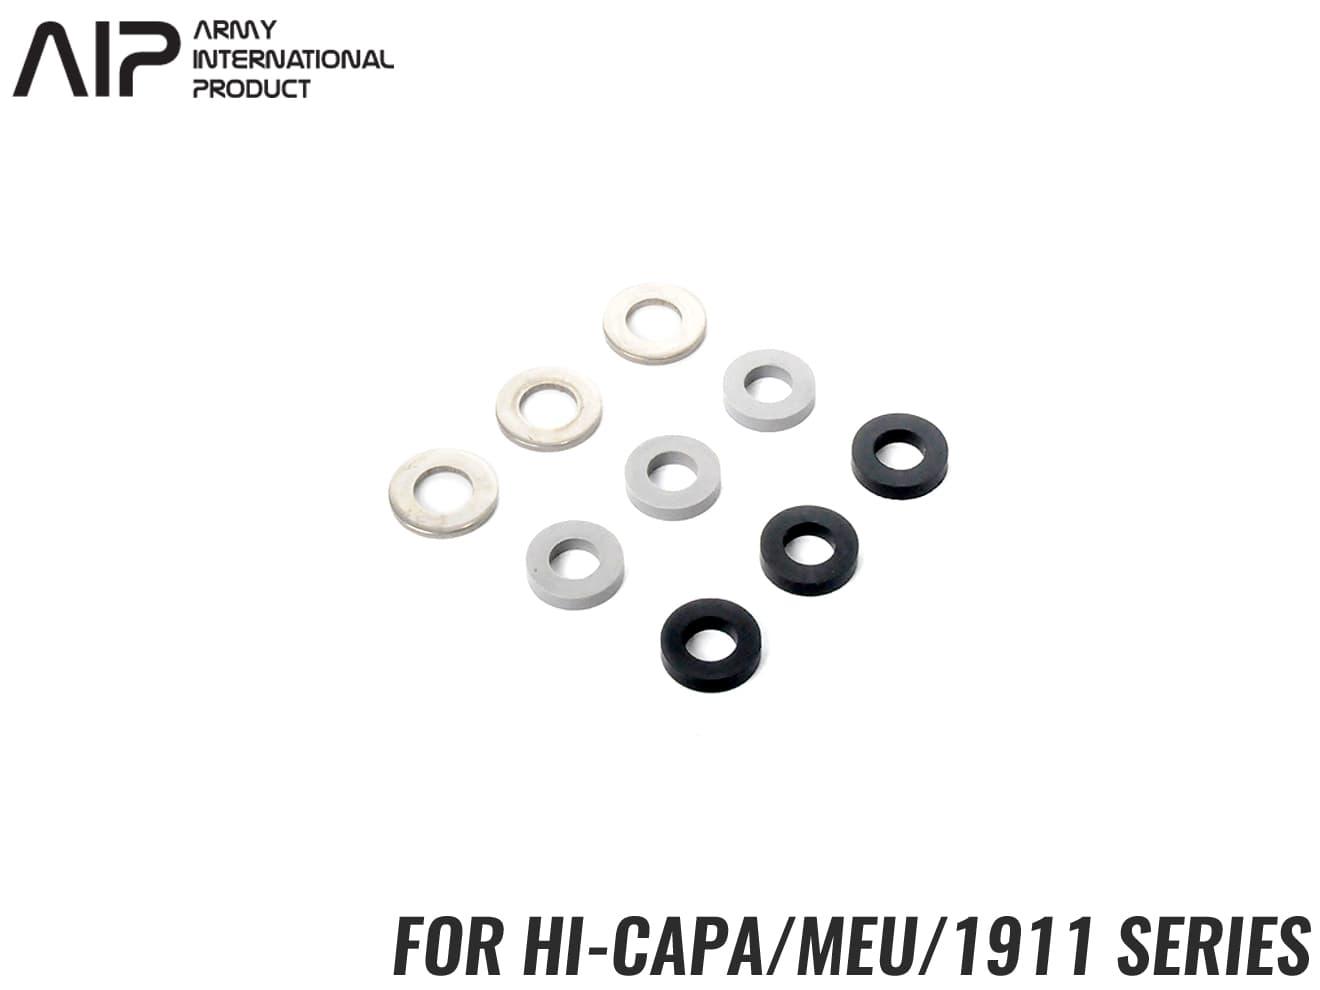 AIP エーアイピー リコイルバッファー ストローク変更 ブローバックスピードの調整 ストローク量調整 MEUピストル M1911A1 ハイキャパ4.3 ハイキャパ5.1 改造 ショートストローク化に 市場 カスタム GBB MEU M1911シリーズ対応 東京マルイ Hi-CAPA 1911 調整パーツ ハイキャパ 最安値挑戦